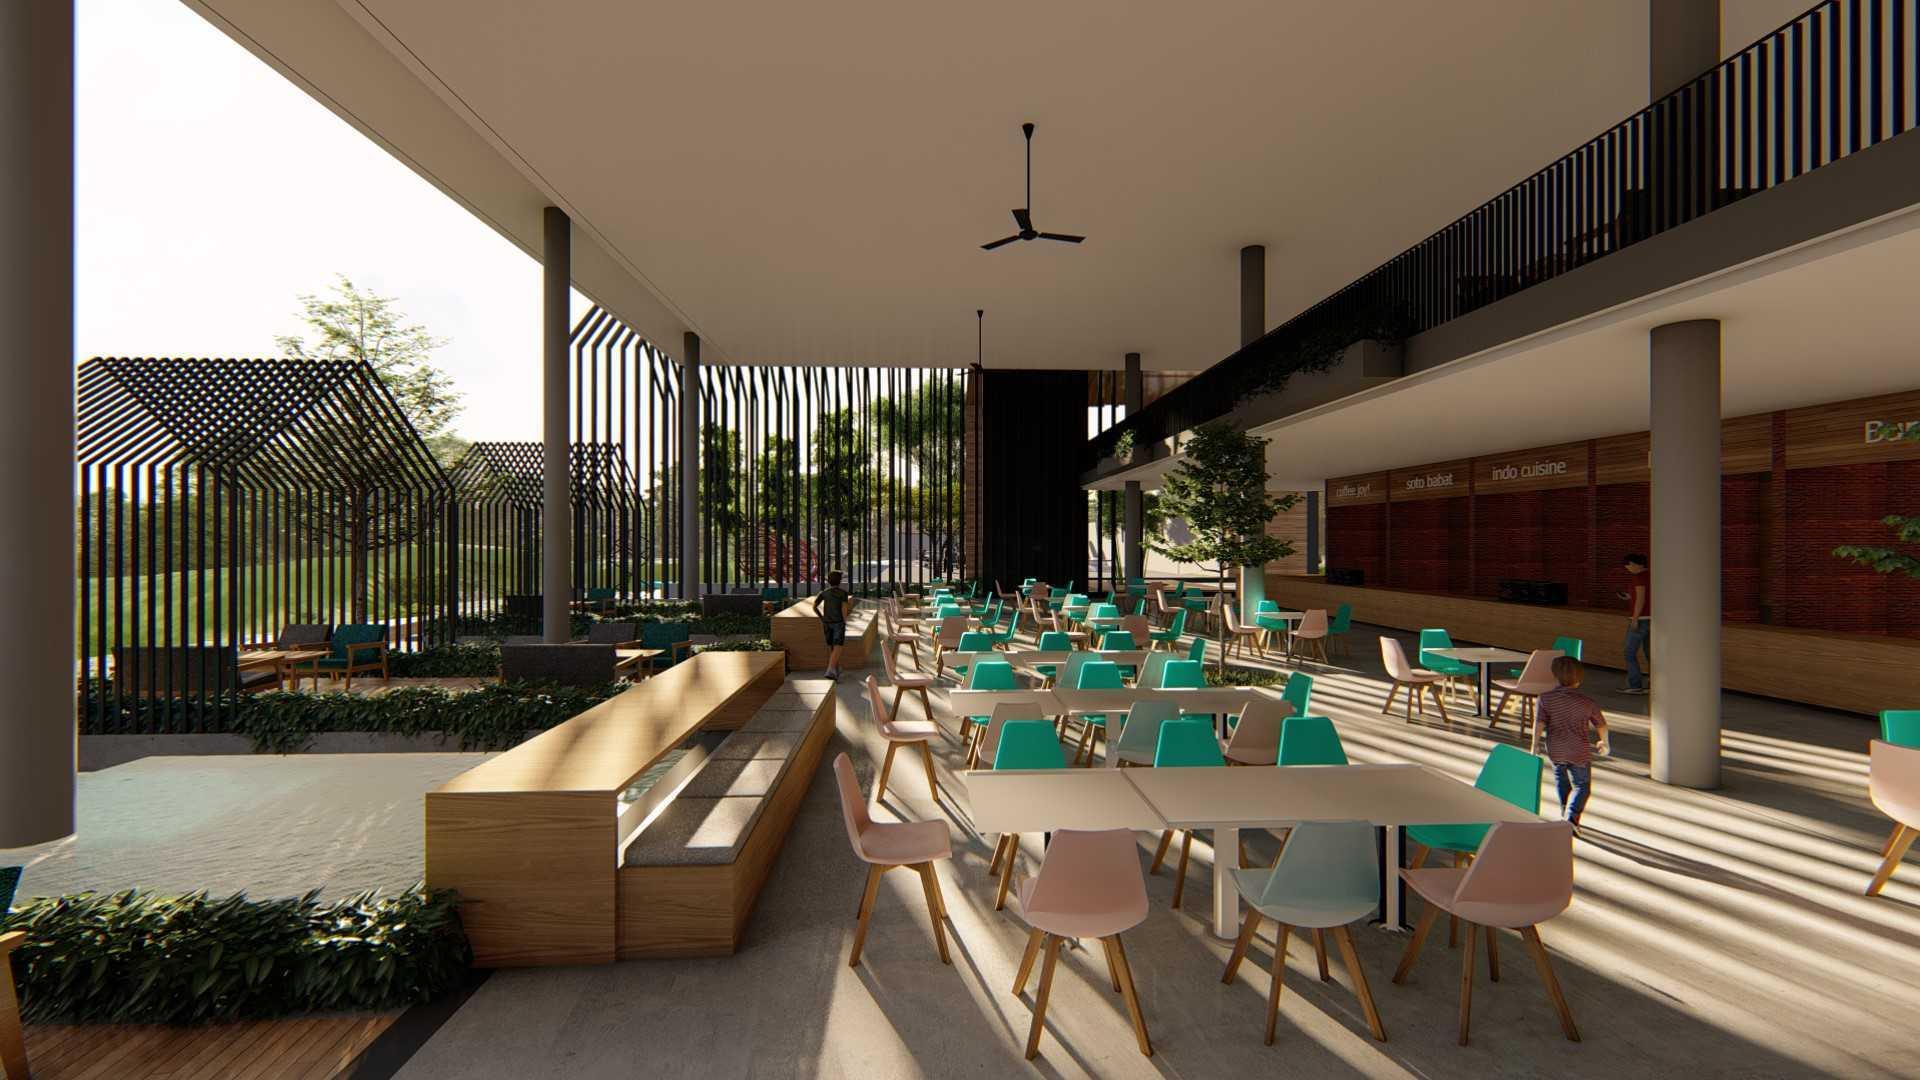 Moi Architects Food Villa Bogor, Jawa Barat, Indonesia Bogor, Jawa Barat, Indonesia Moi-Architects-Food-Villa  58562